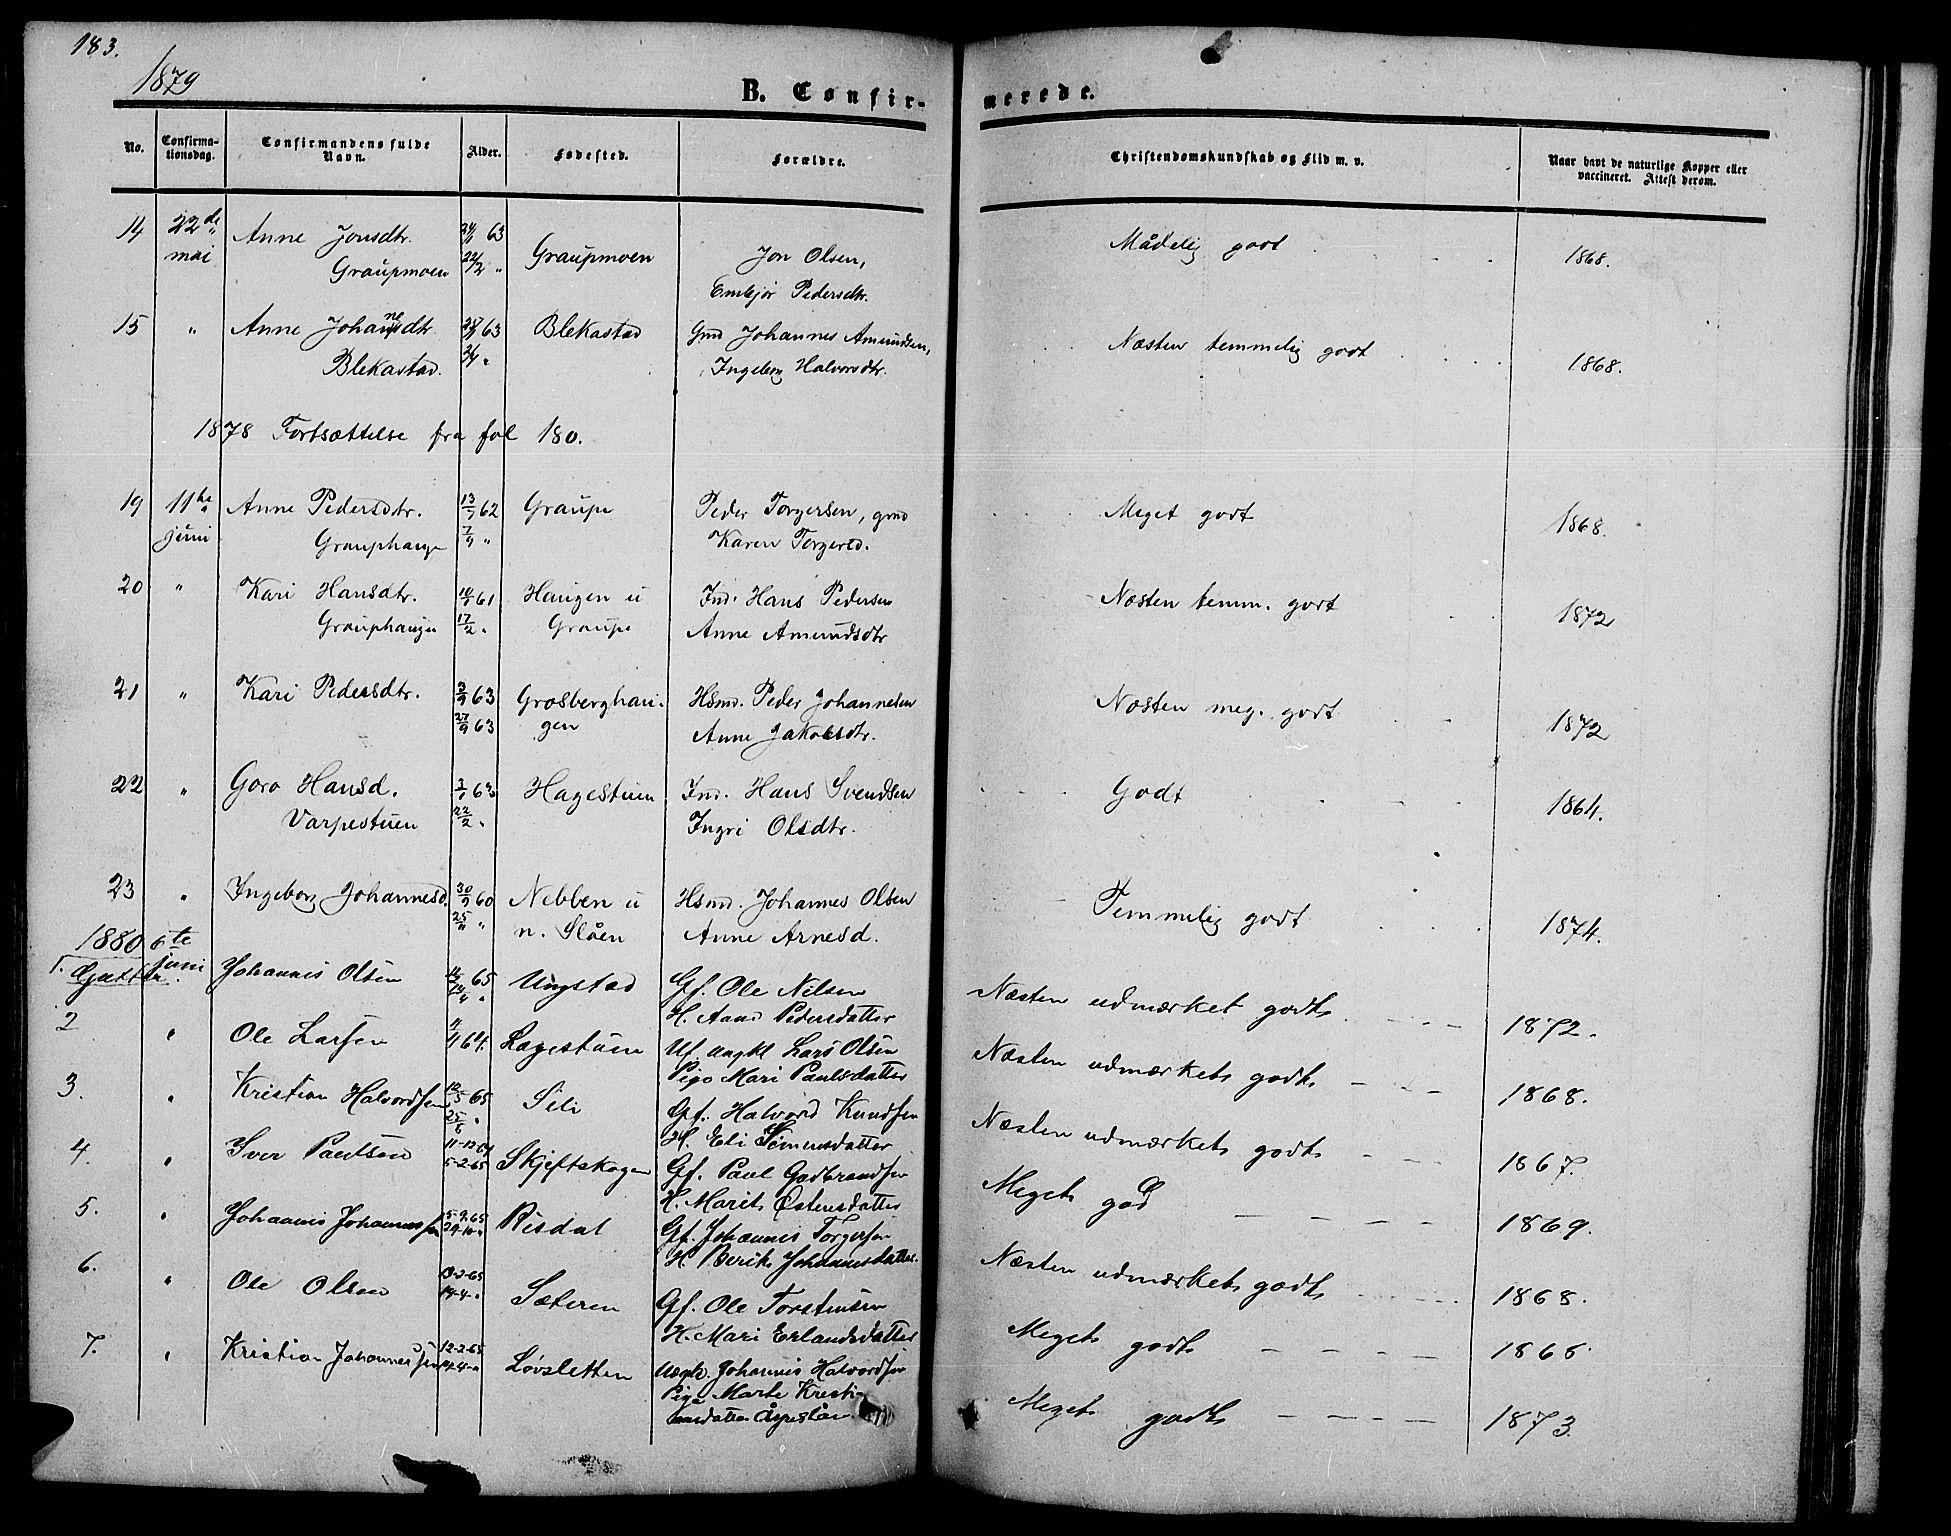 SAH, Nord-Fron prestekontor, Klokkerbok nr. 2, 1851-1883, s. 183